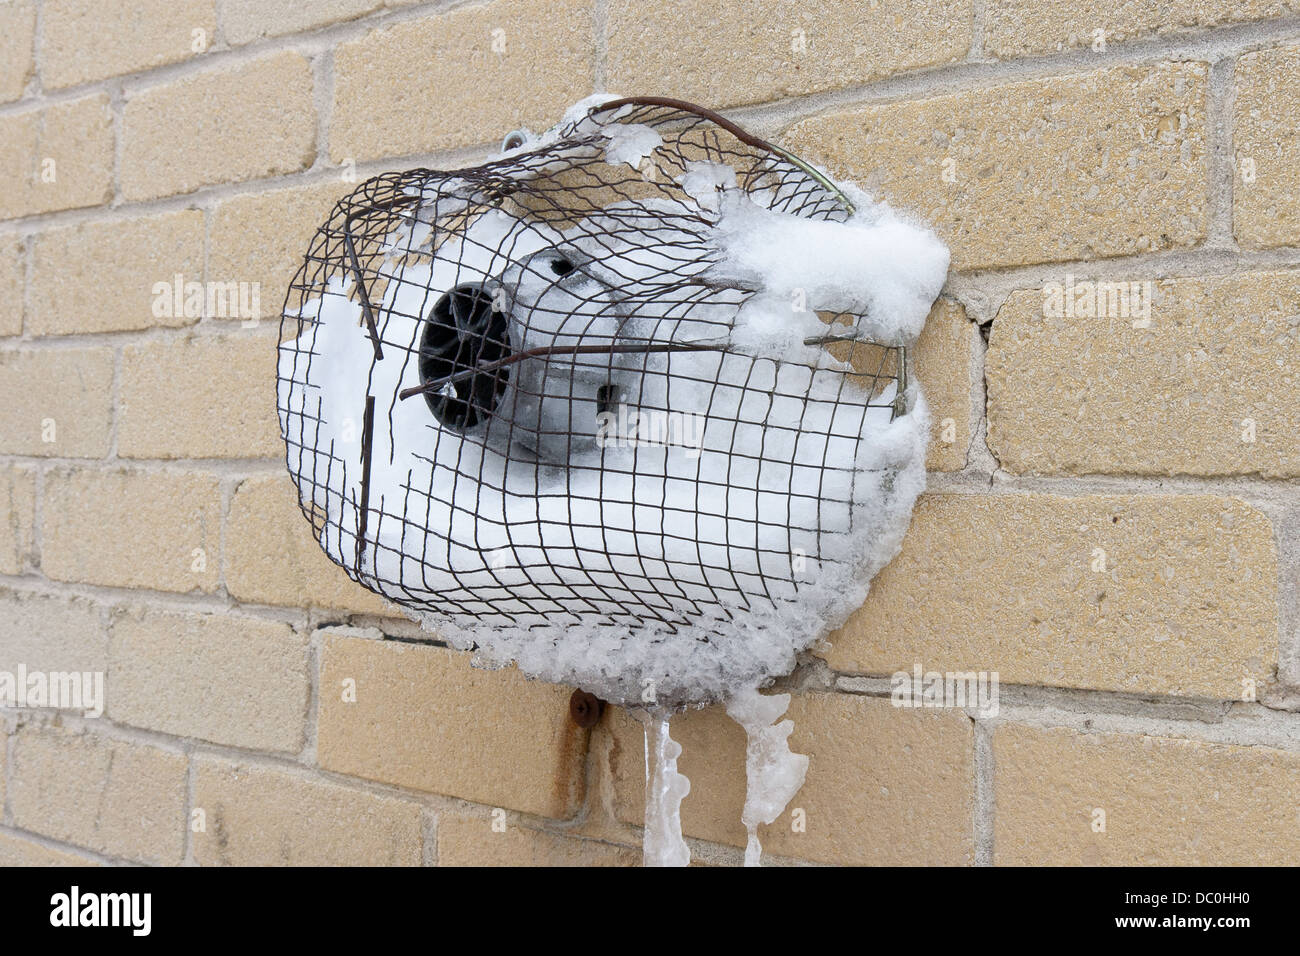 Gas Central Heating Flue Stock Photos & Gas Central Heating Flue ...